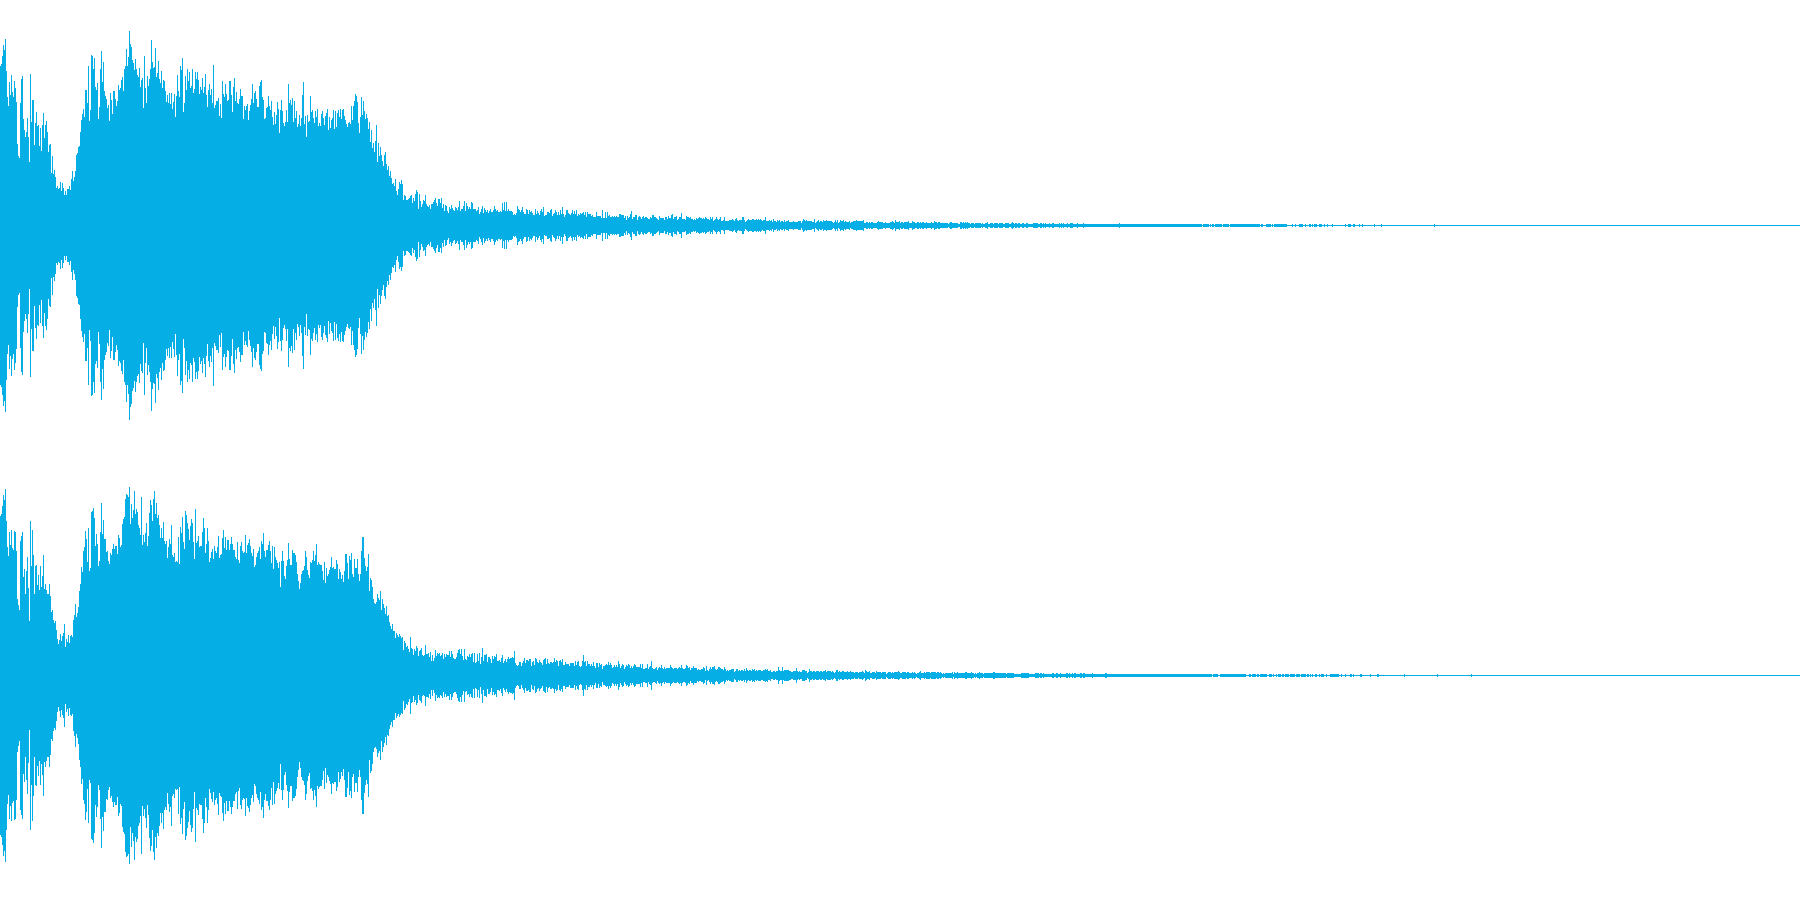 DJFX ヒットチャート発表前SE 10の再生済みの波形